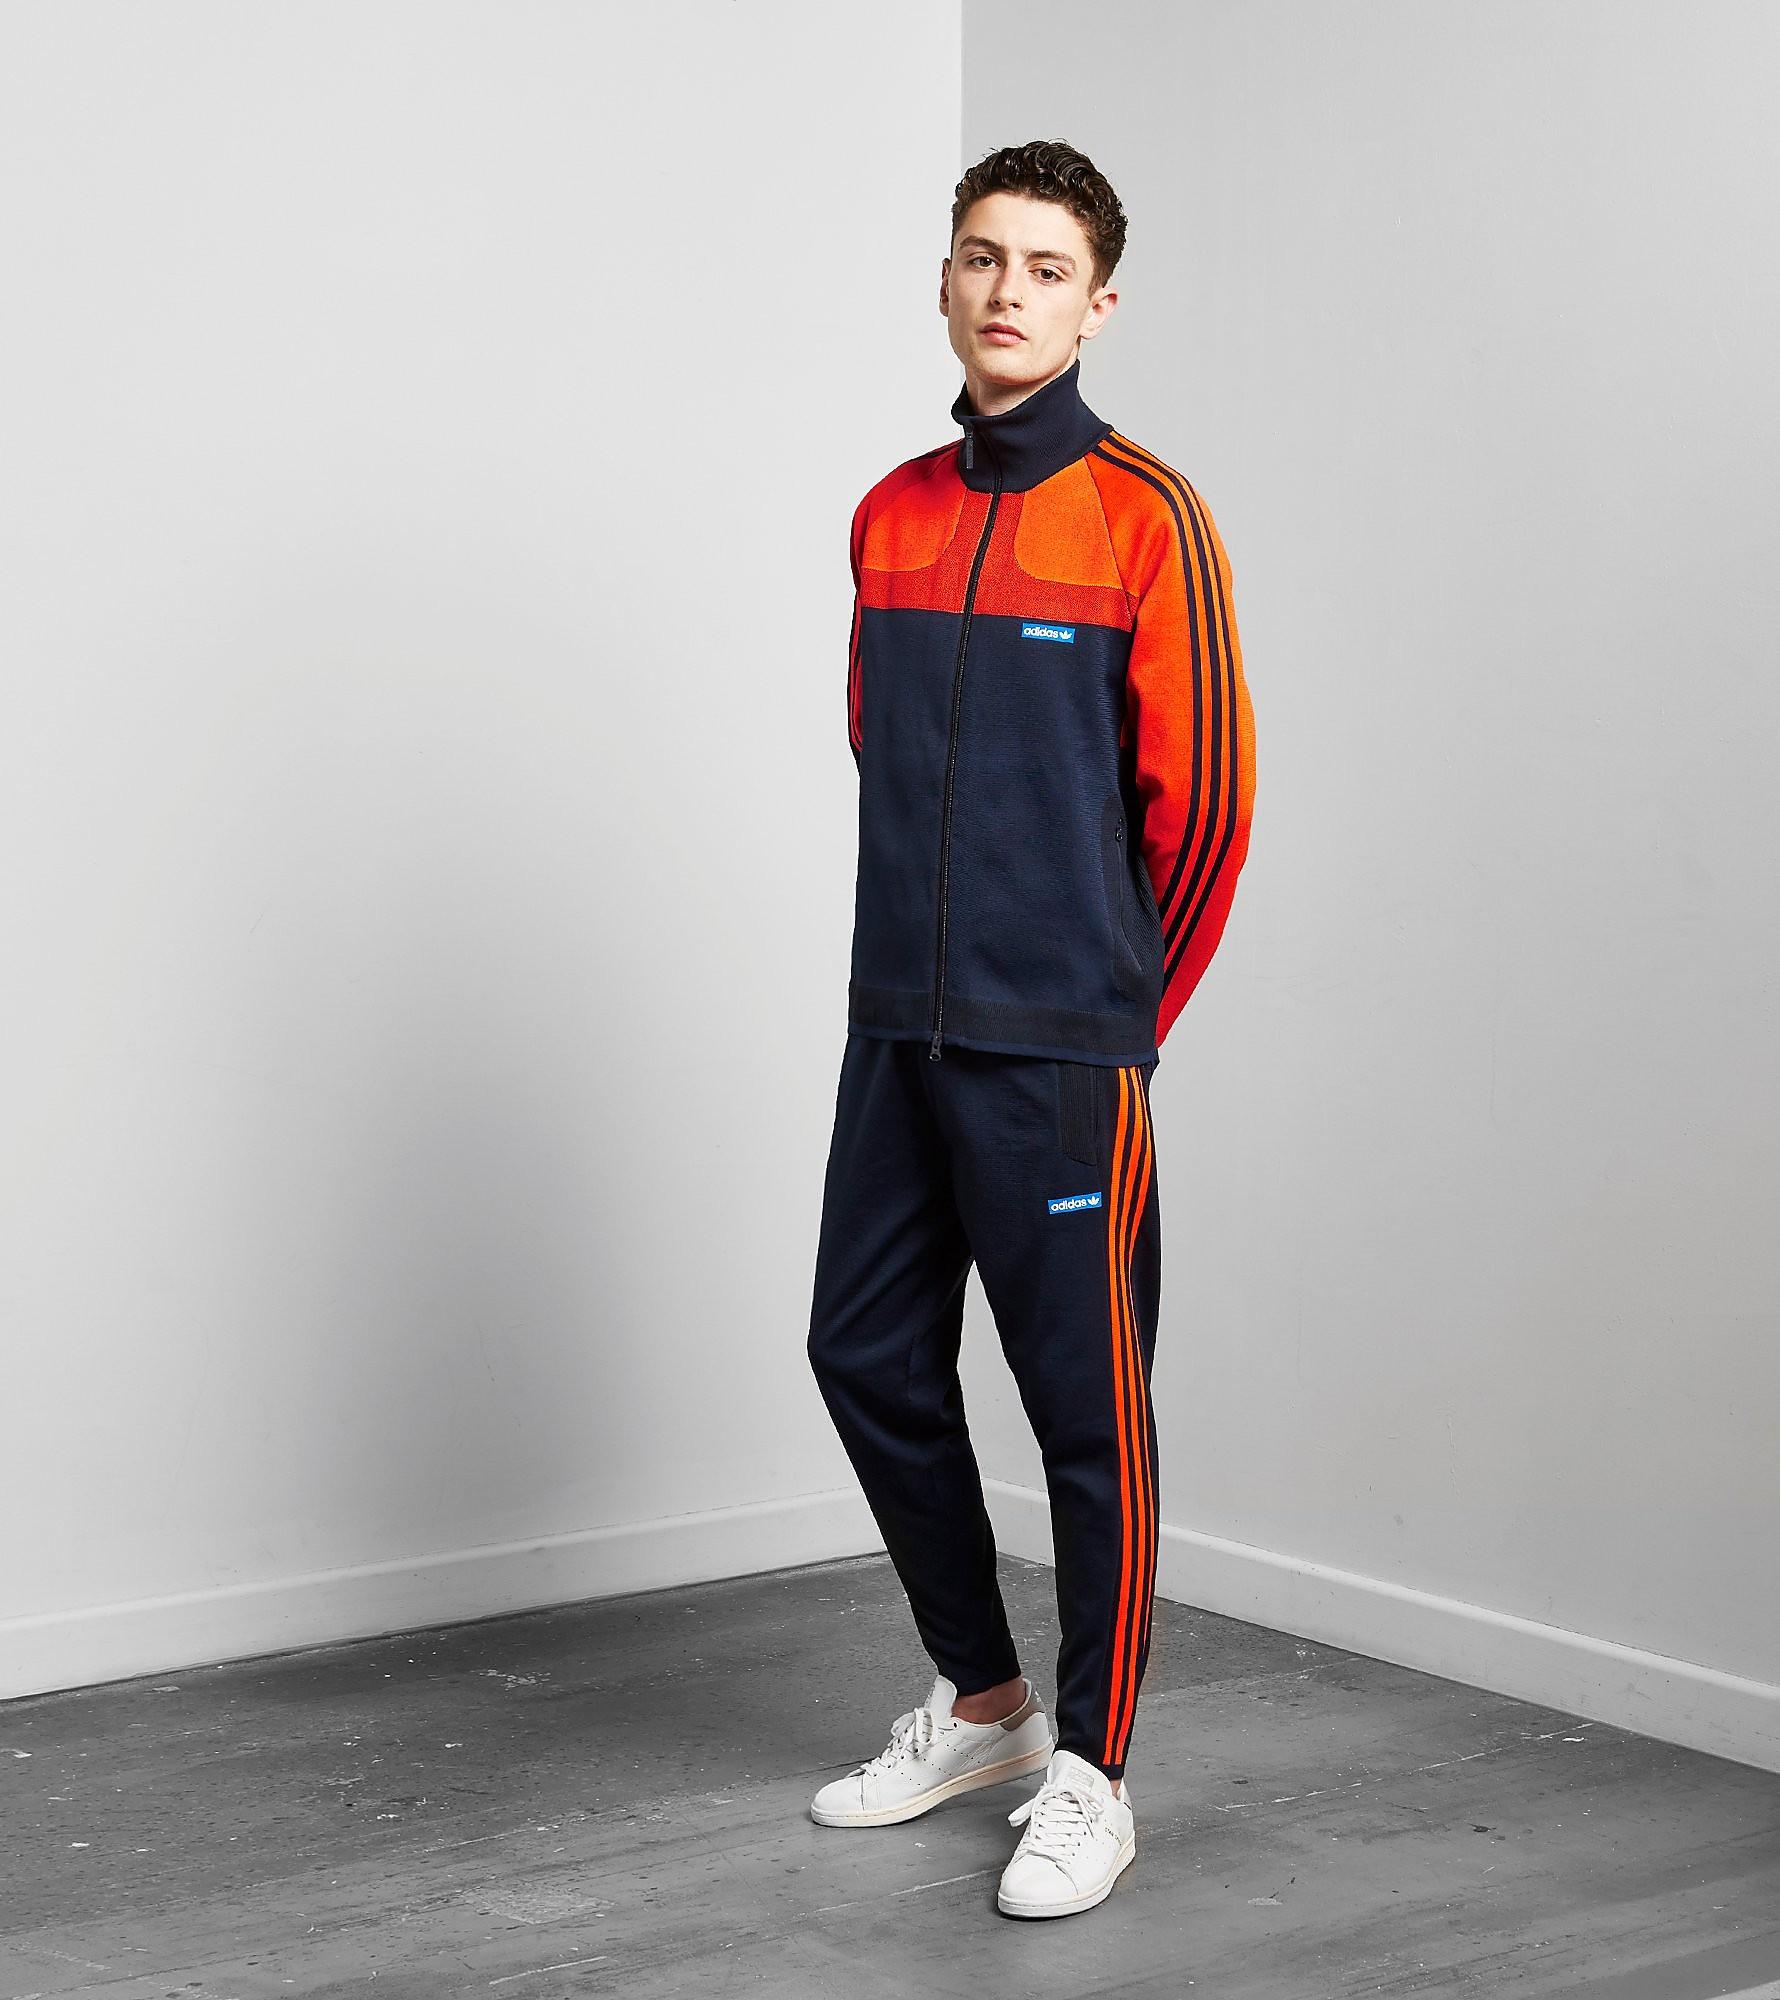 adidas Originals OG Primeknit Tracksuit